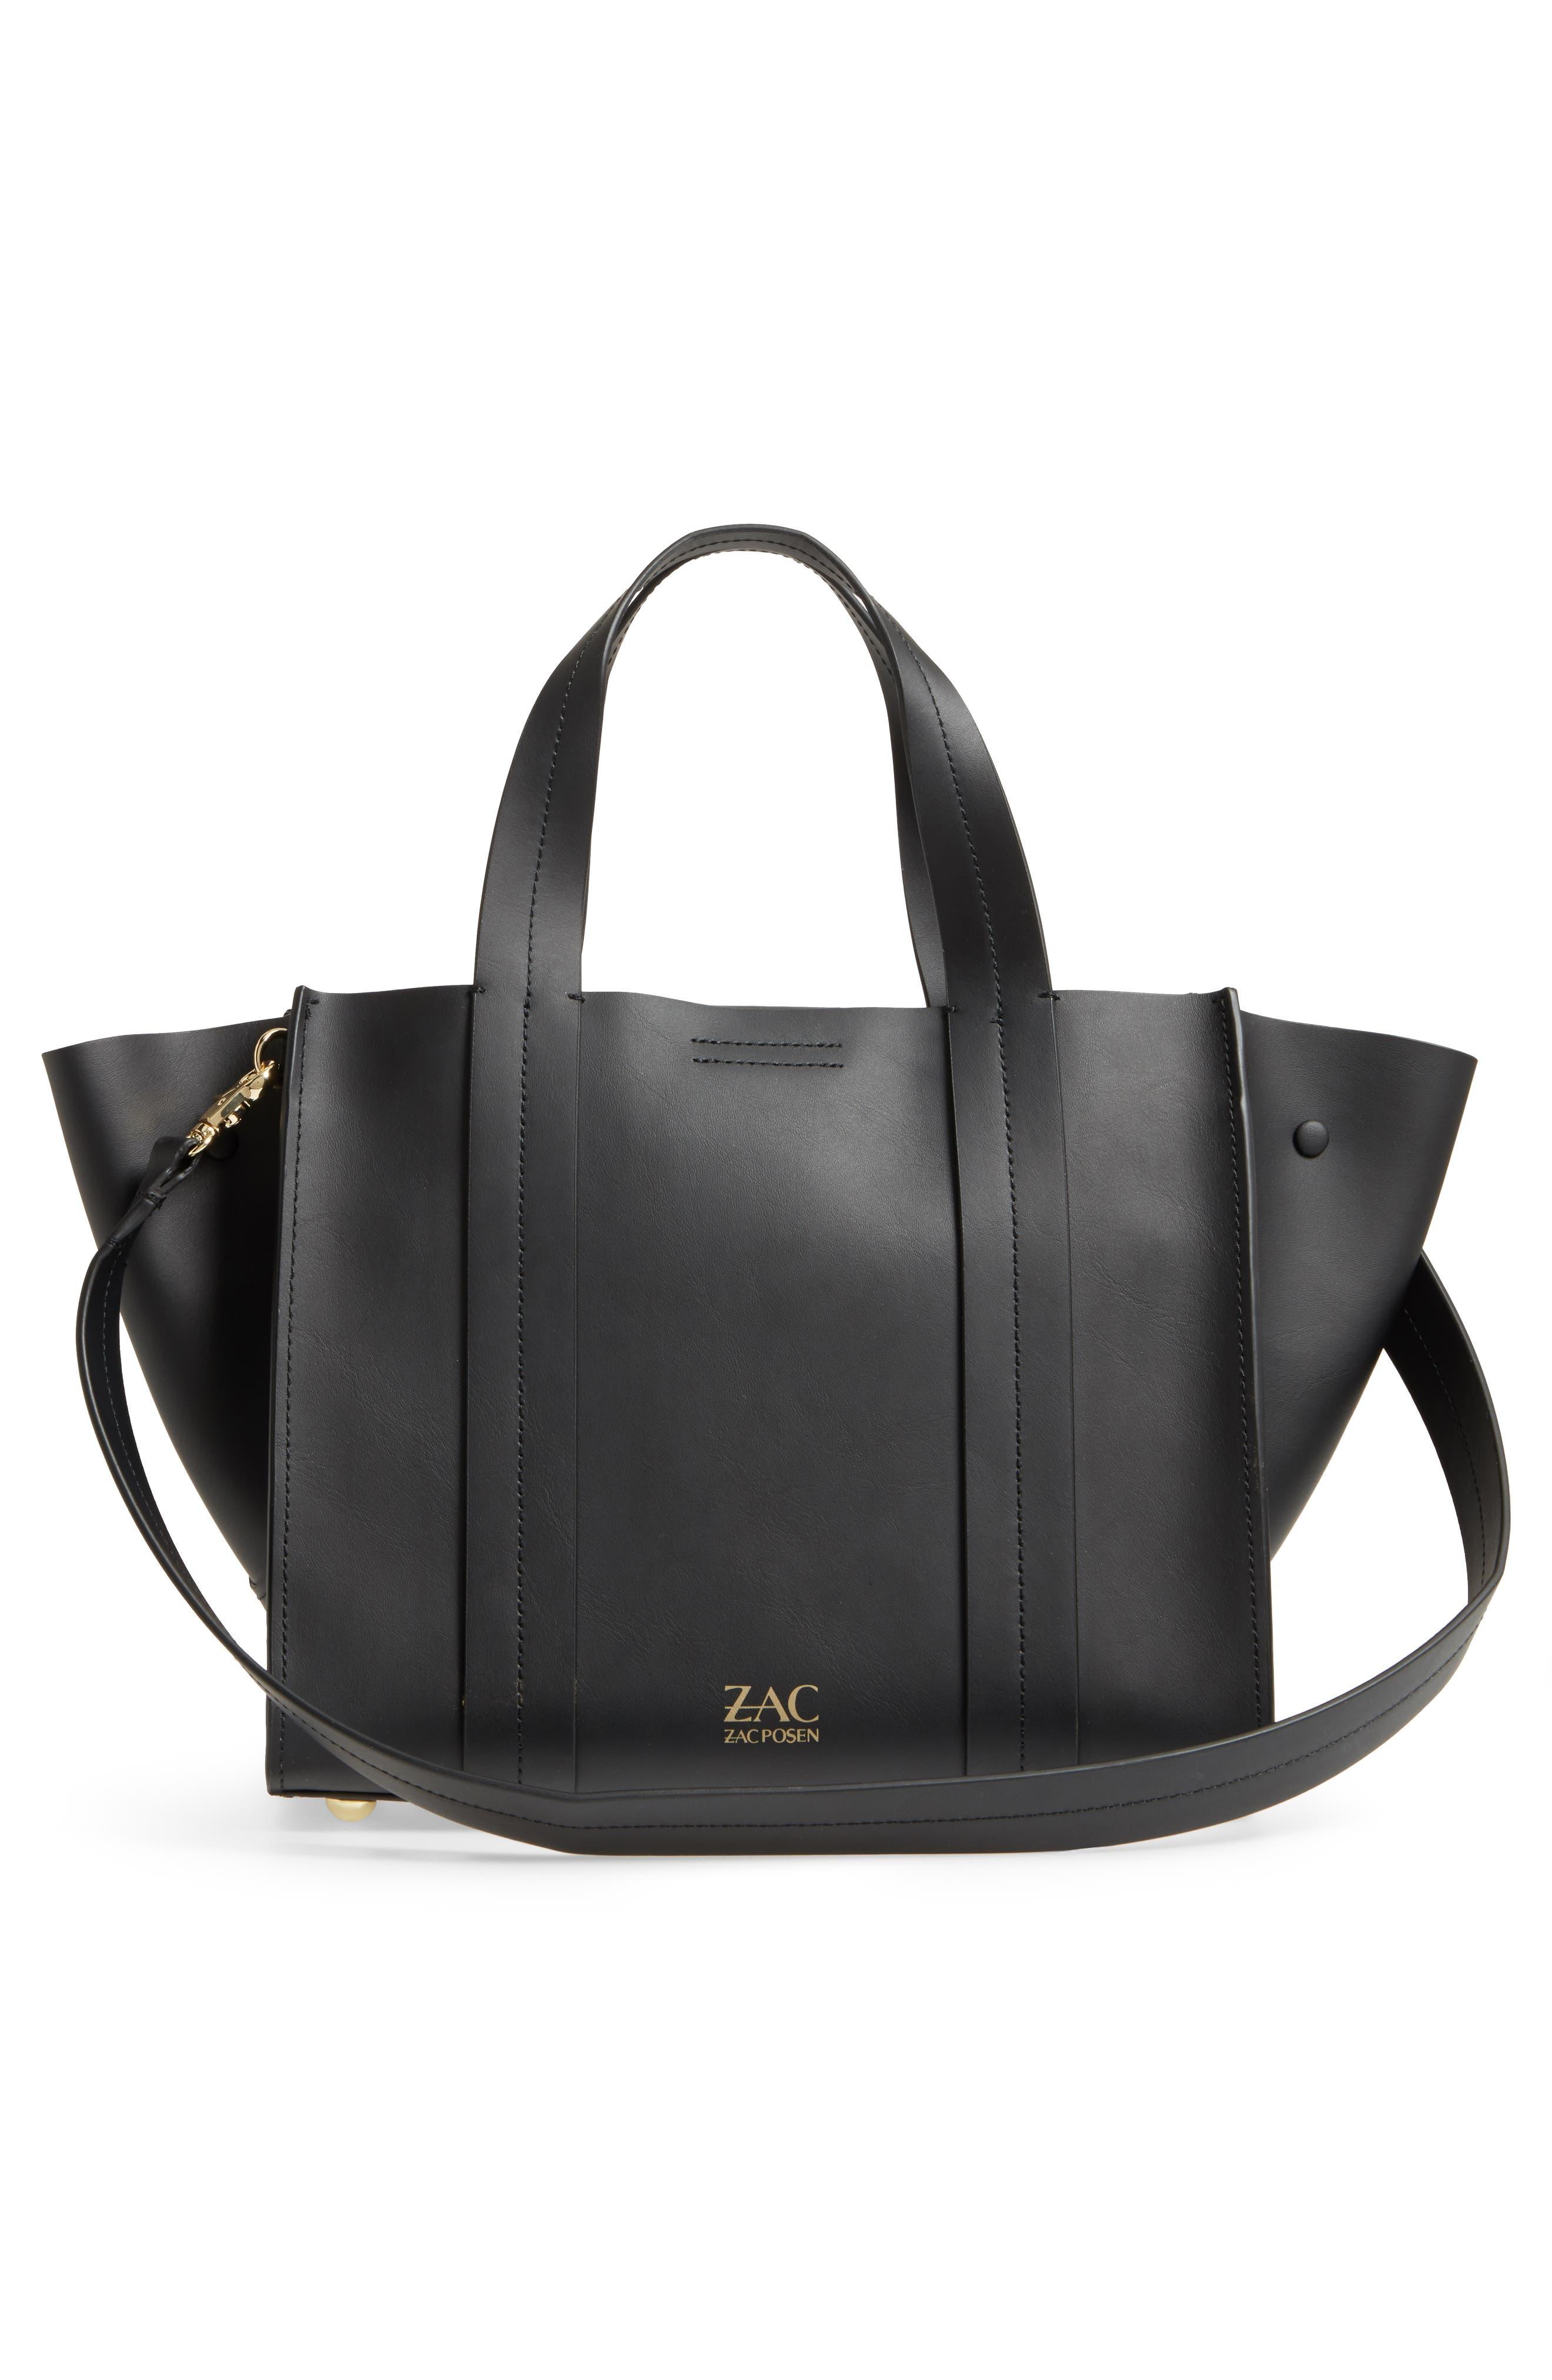 ZAC Zac Posen Eartha Iconic Calfskin Leather Double Handle Satchel,                             Alternate thumbnail 3, color,                             Black